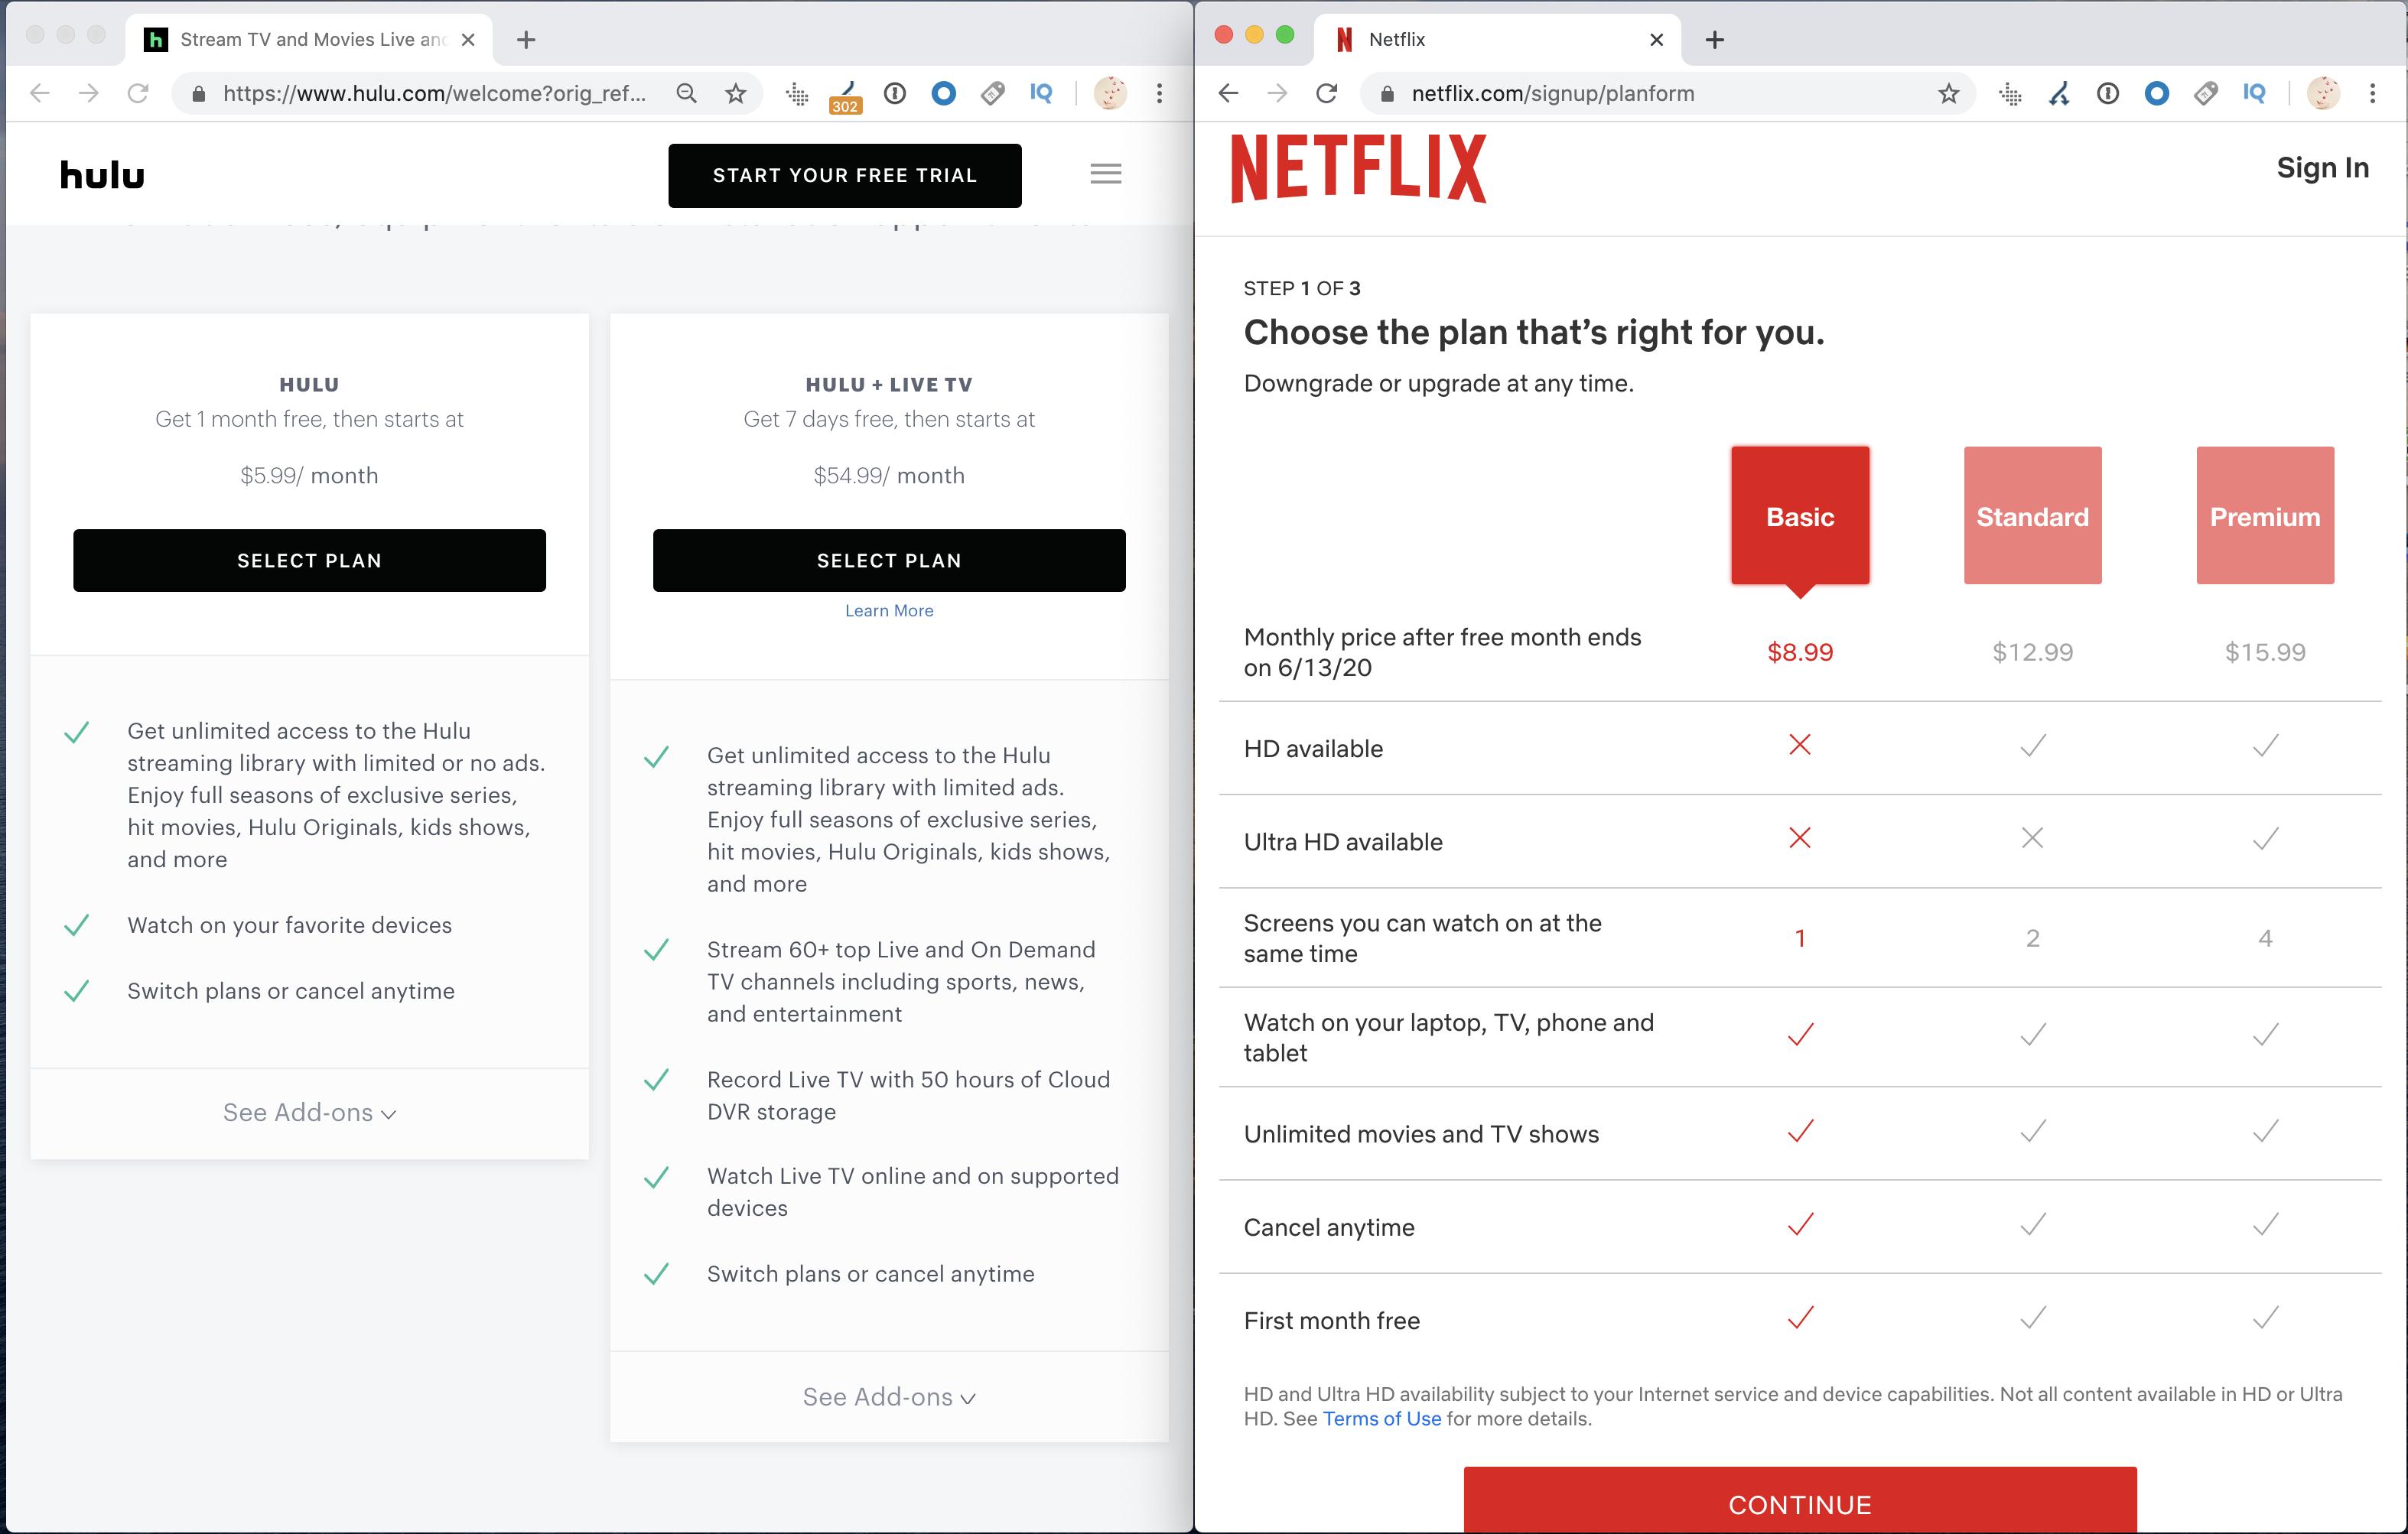 Hulu VS Netflix pricing plans